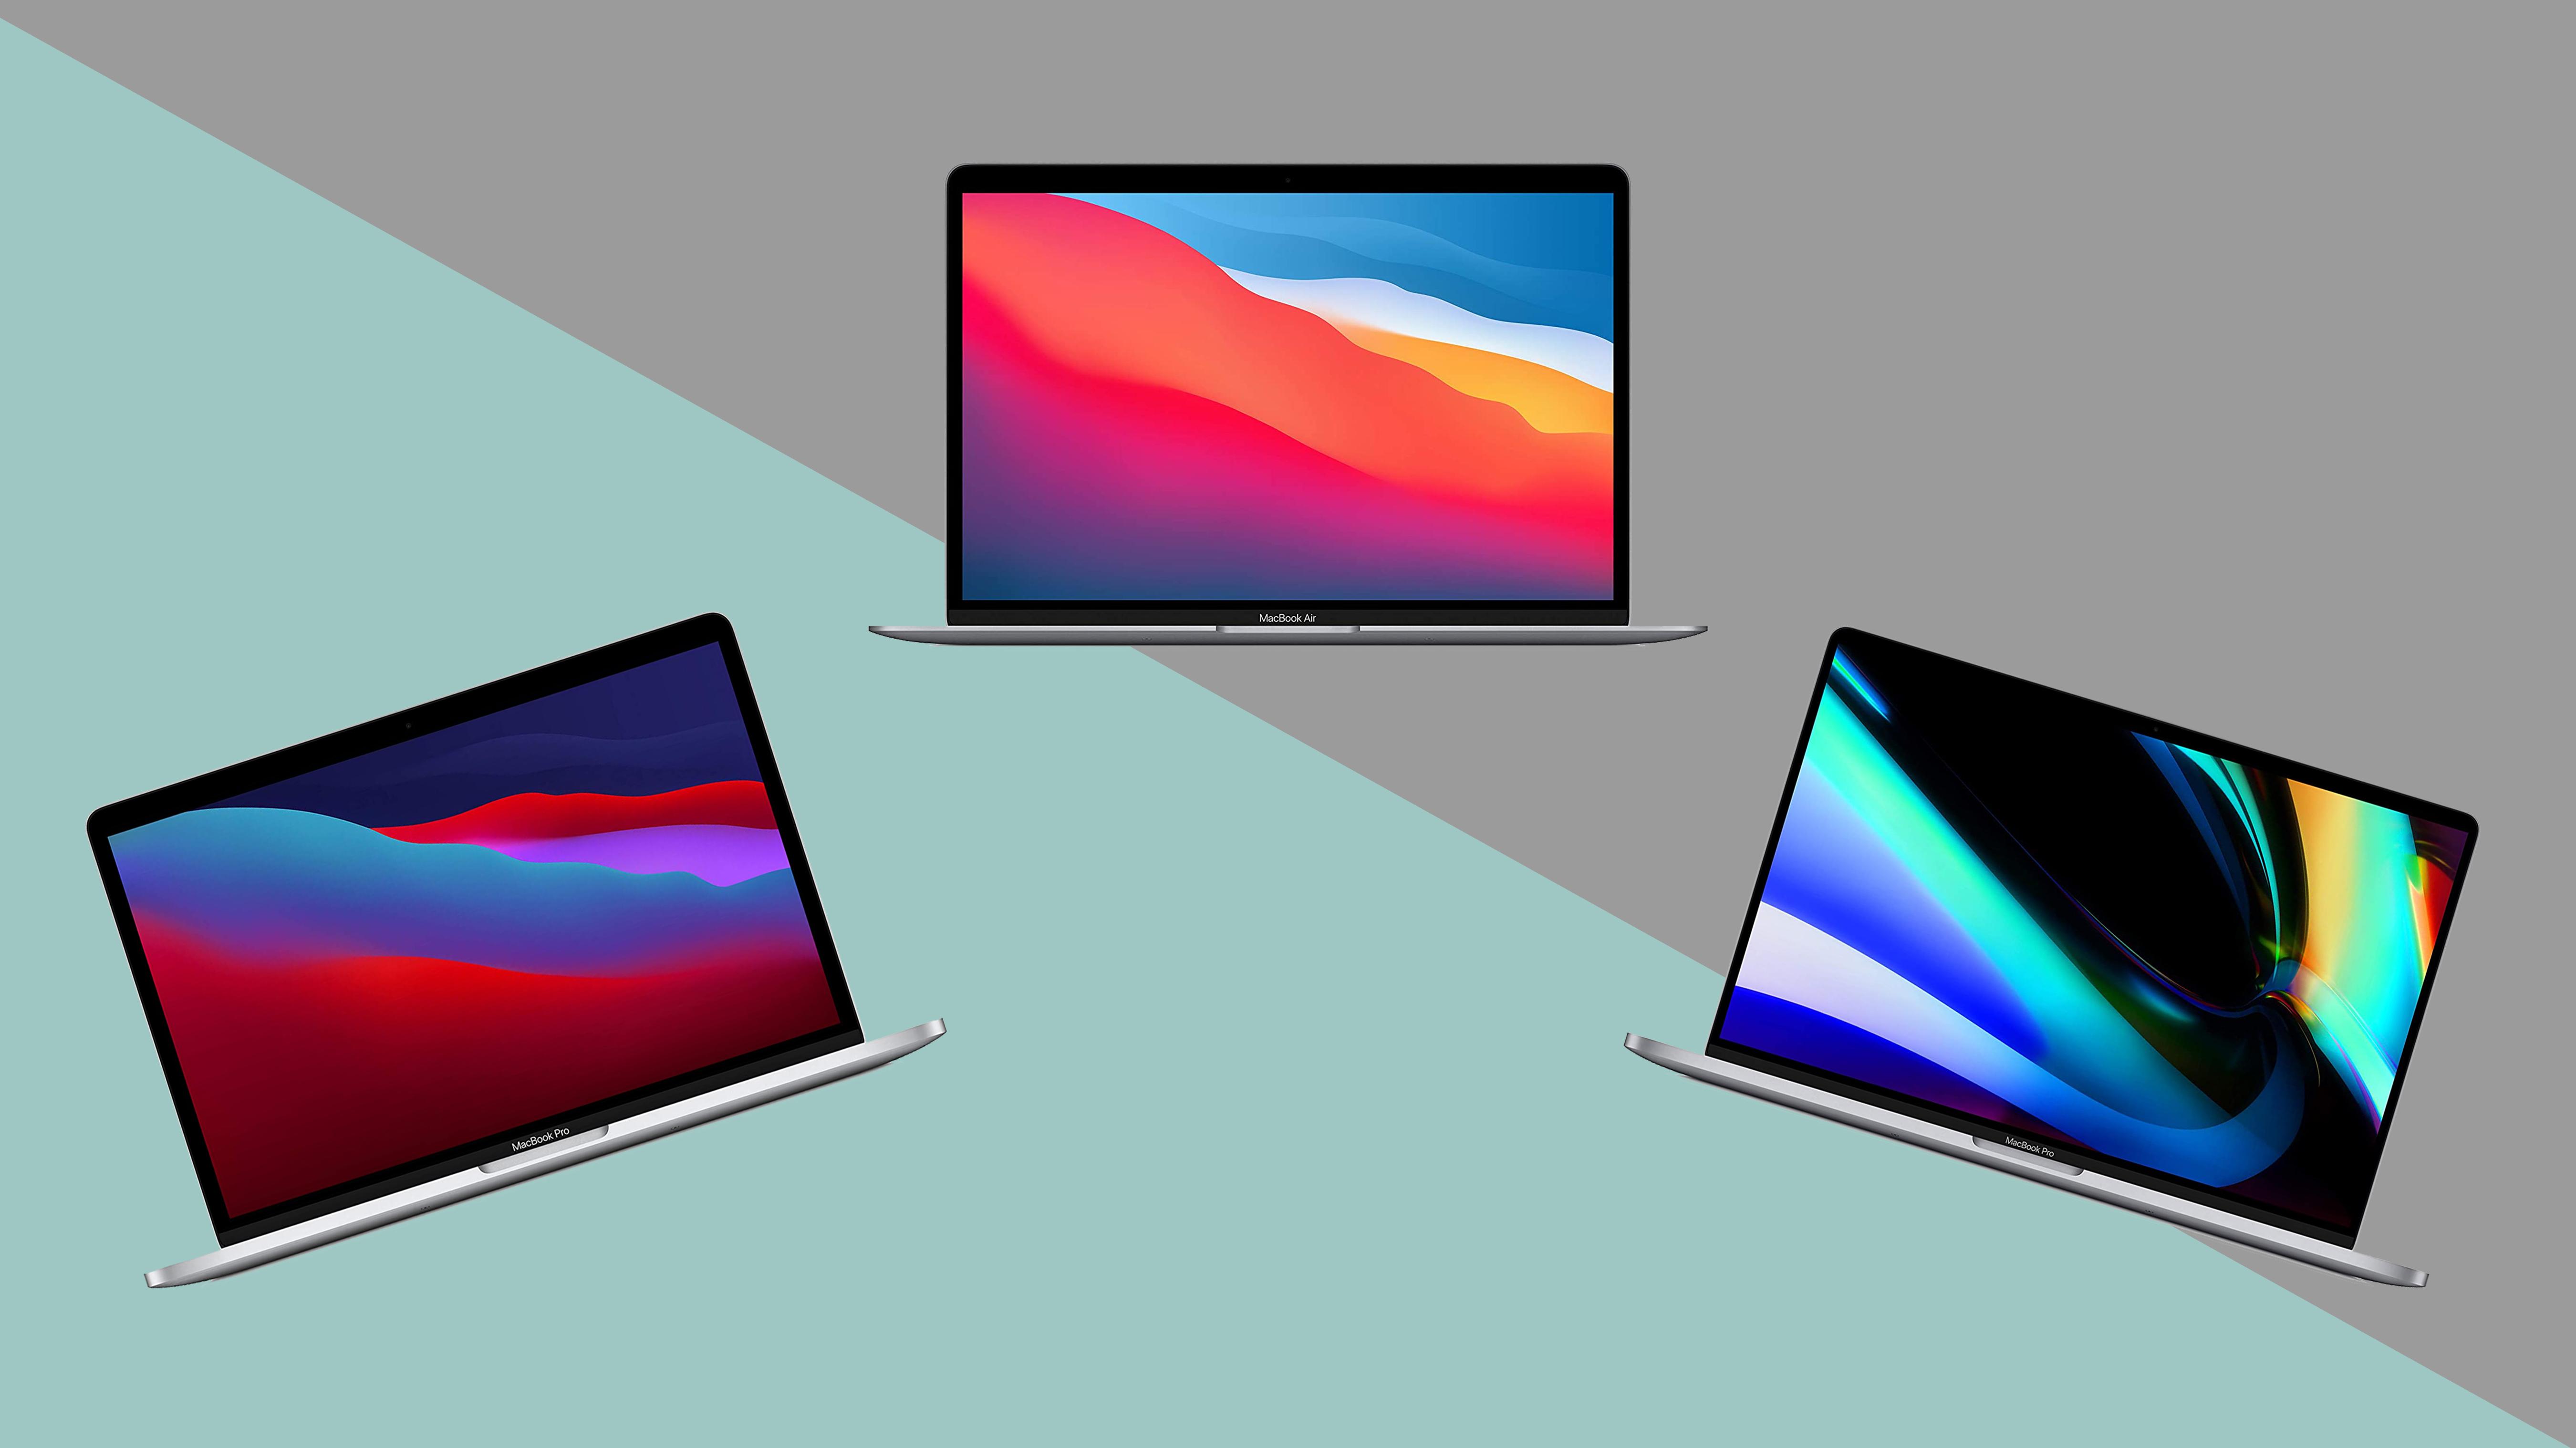 Best Mac Laptops To Buy 2020 Macbook Air 13 Inch Macbook Pro Or 16 Inch Macbook Pro Cnn Underscored